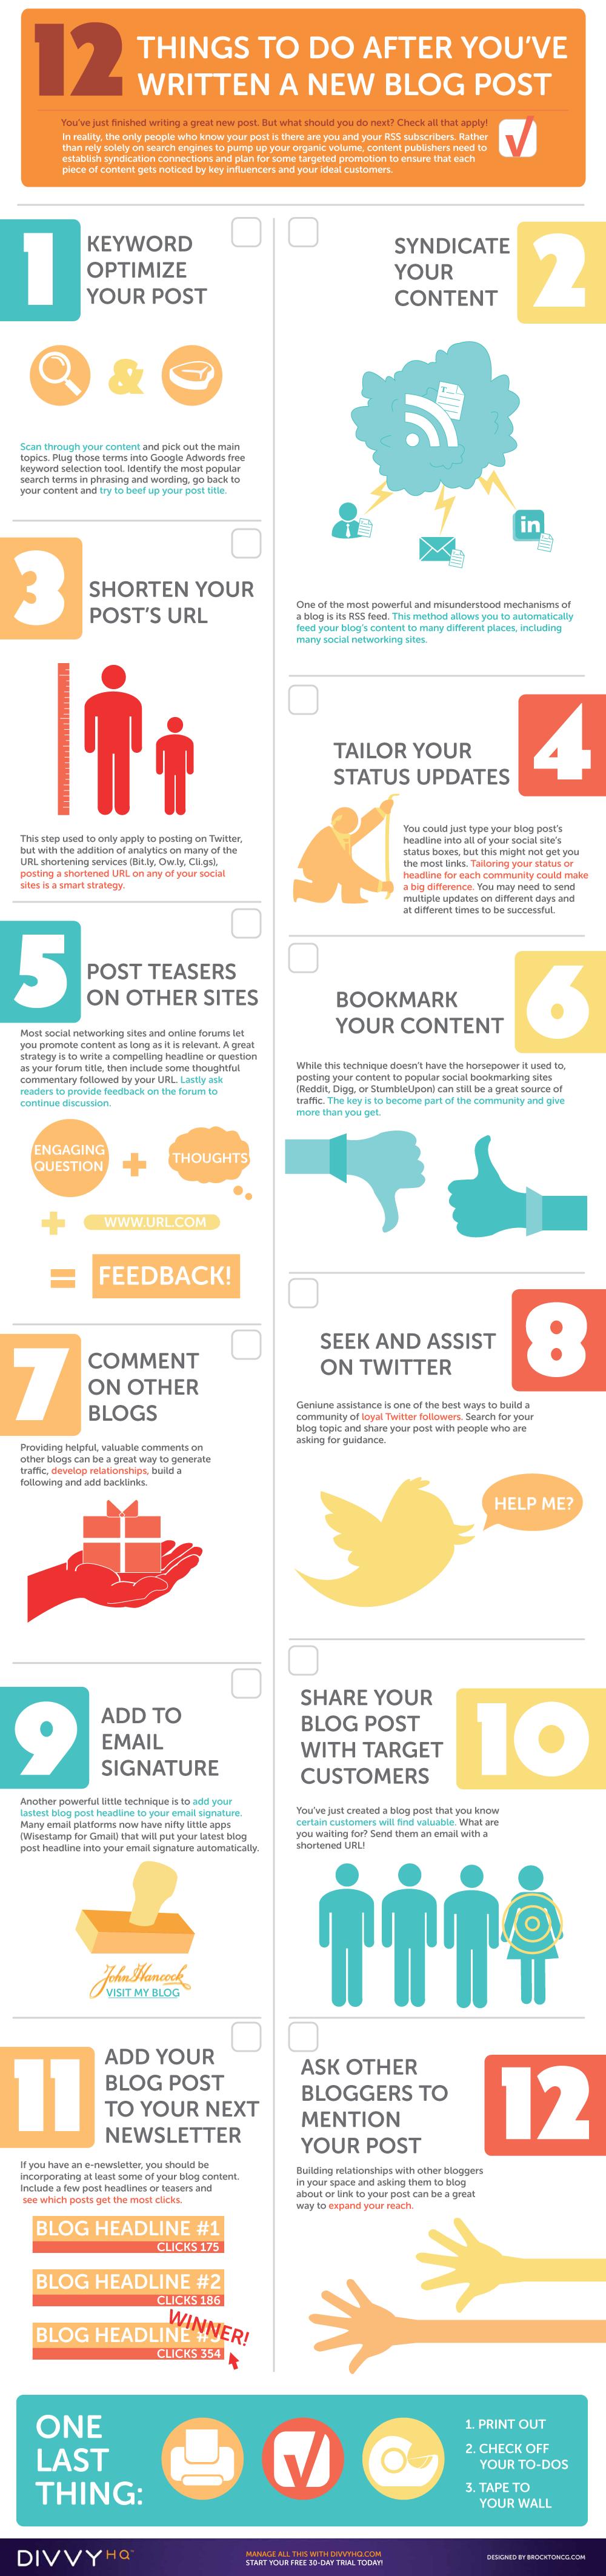 blog post promotion checklist